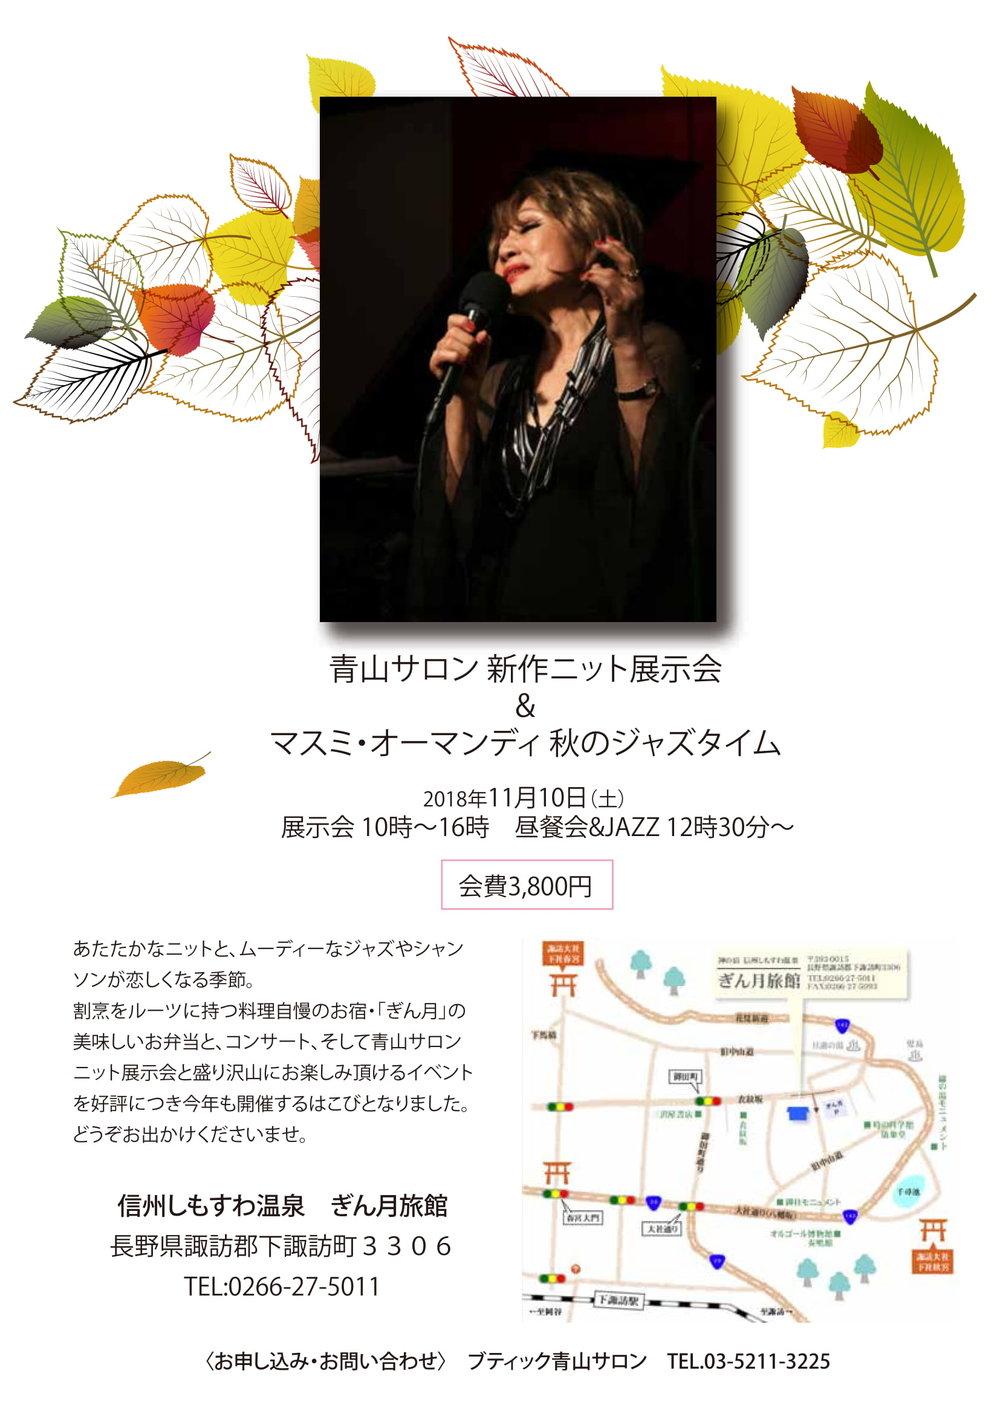 181110-02_masumi-1.jpg